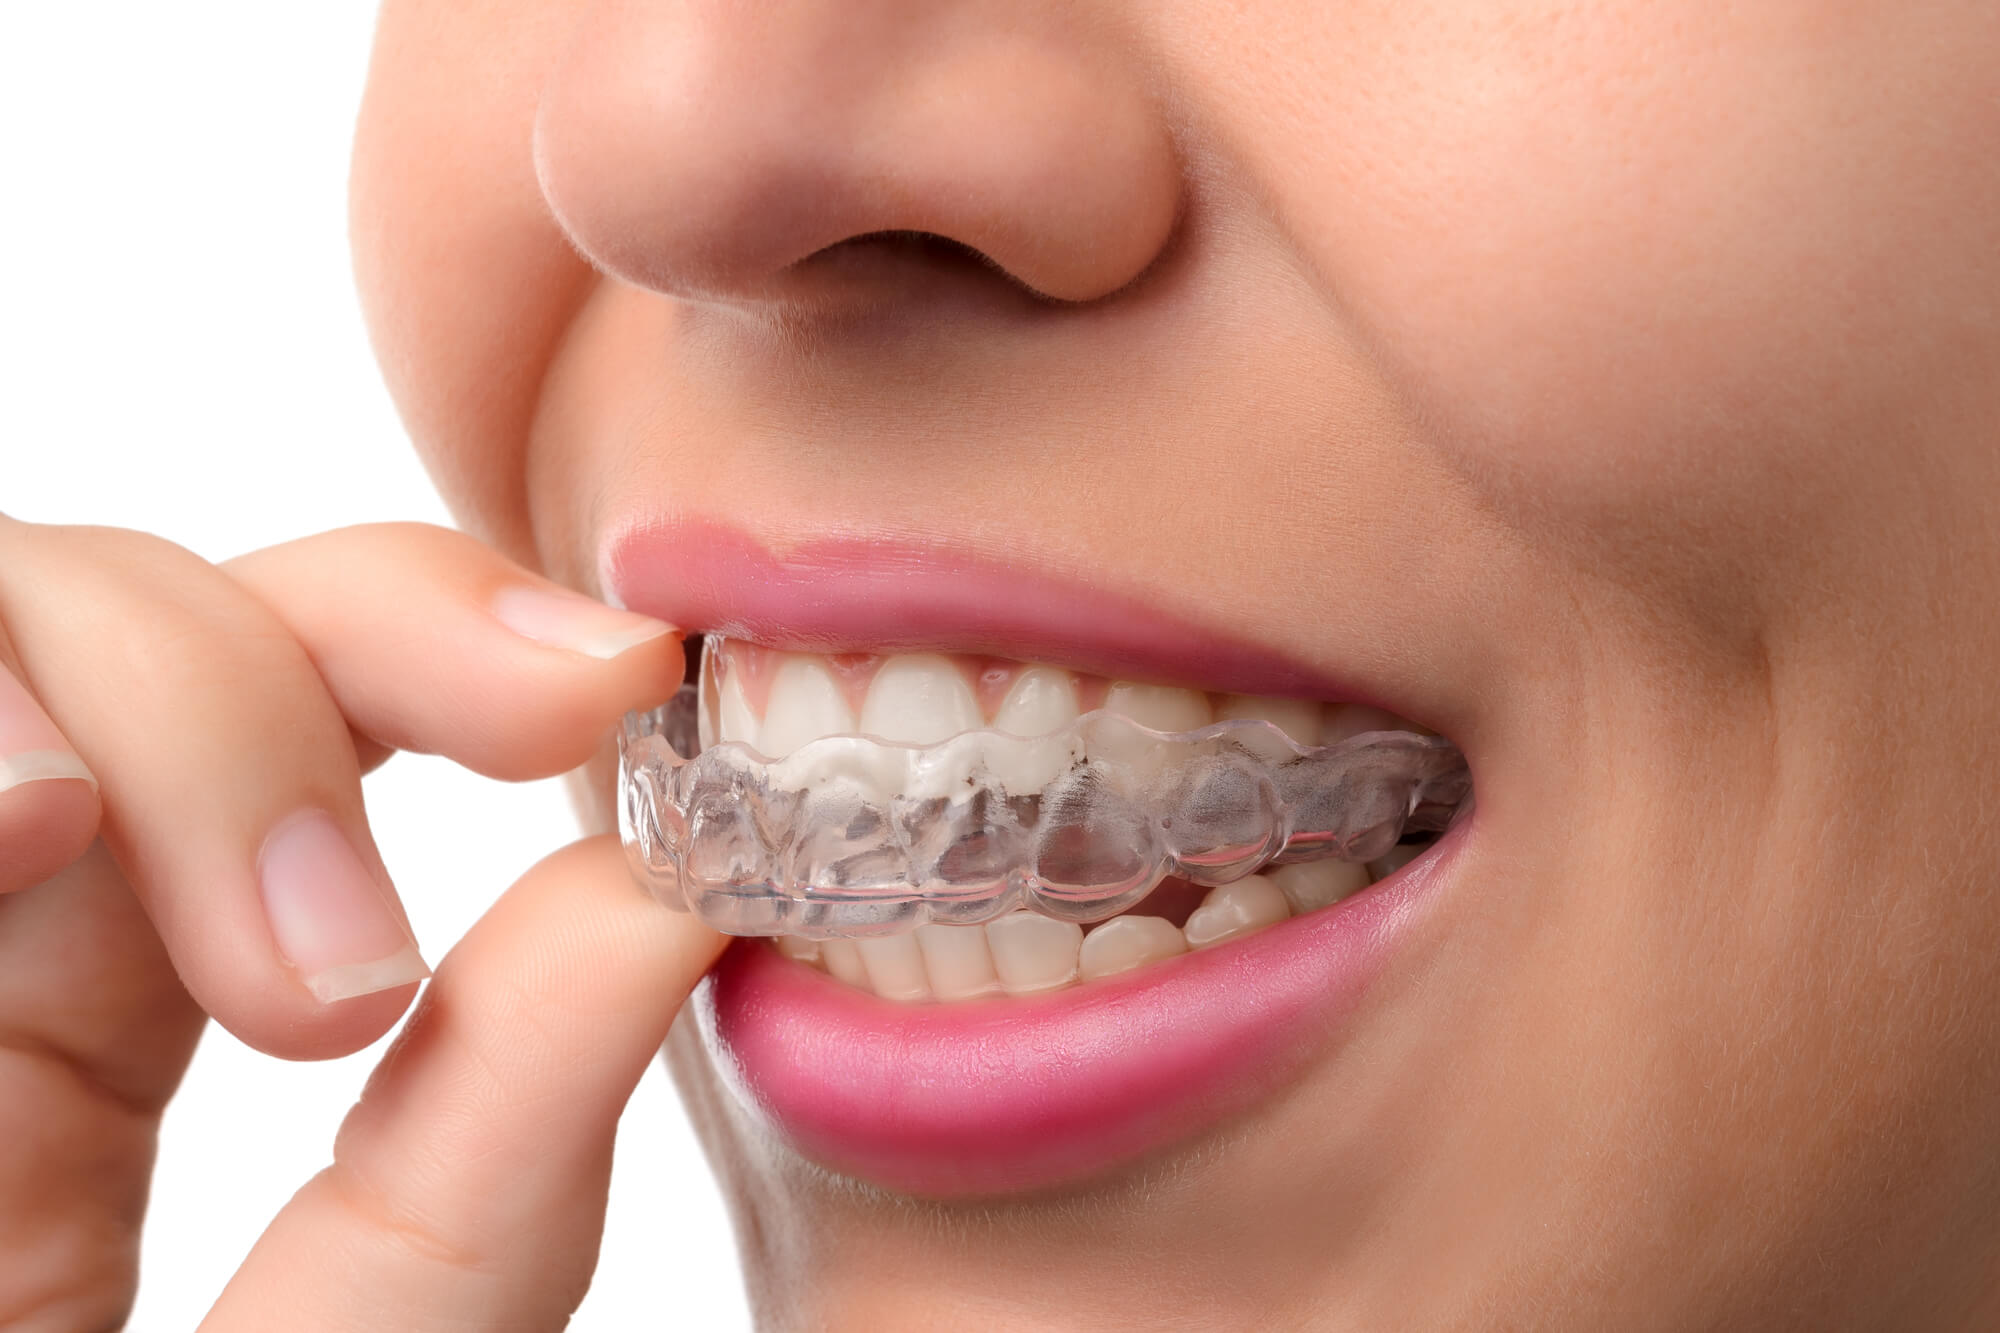 Invisalign treatment at City Dental of Wellington